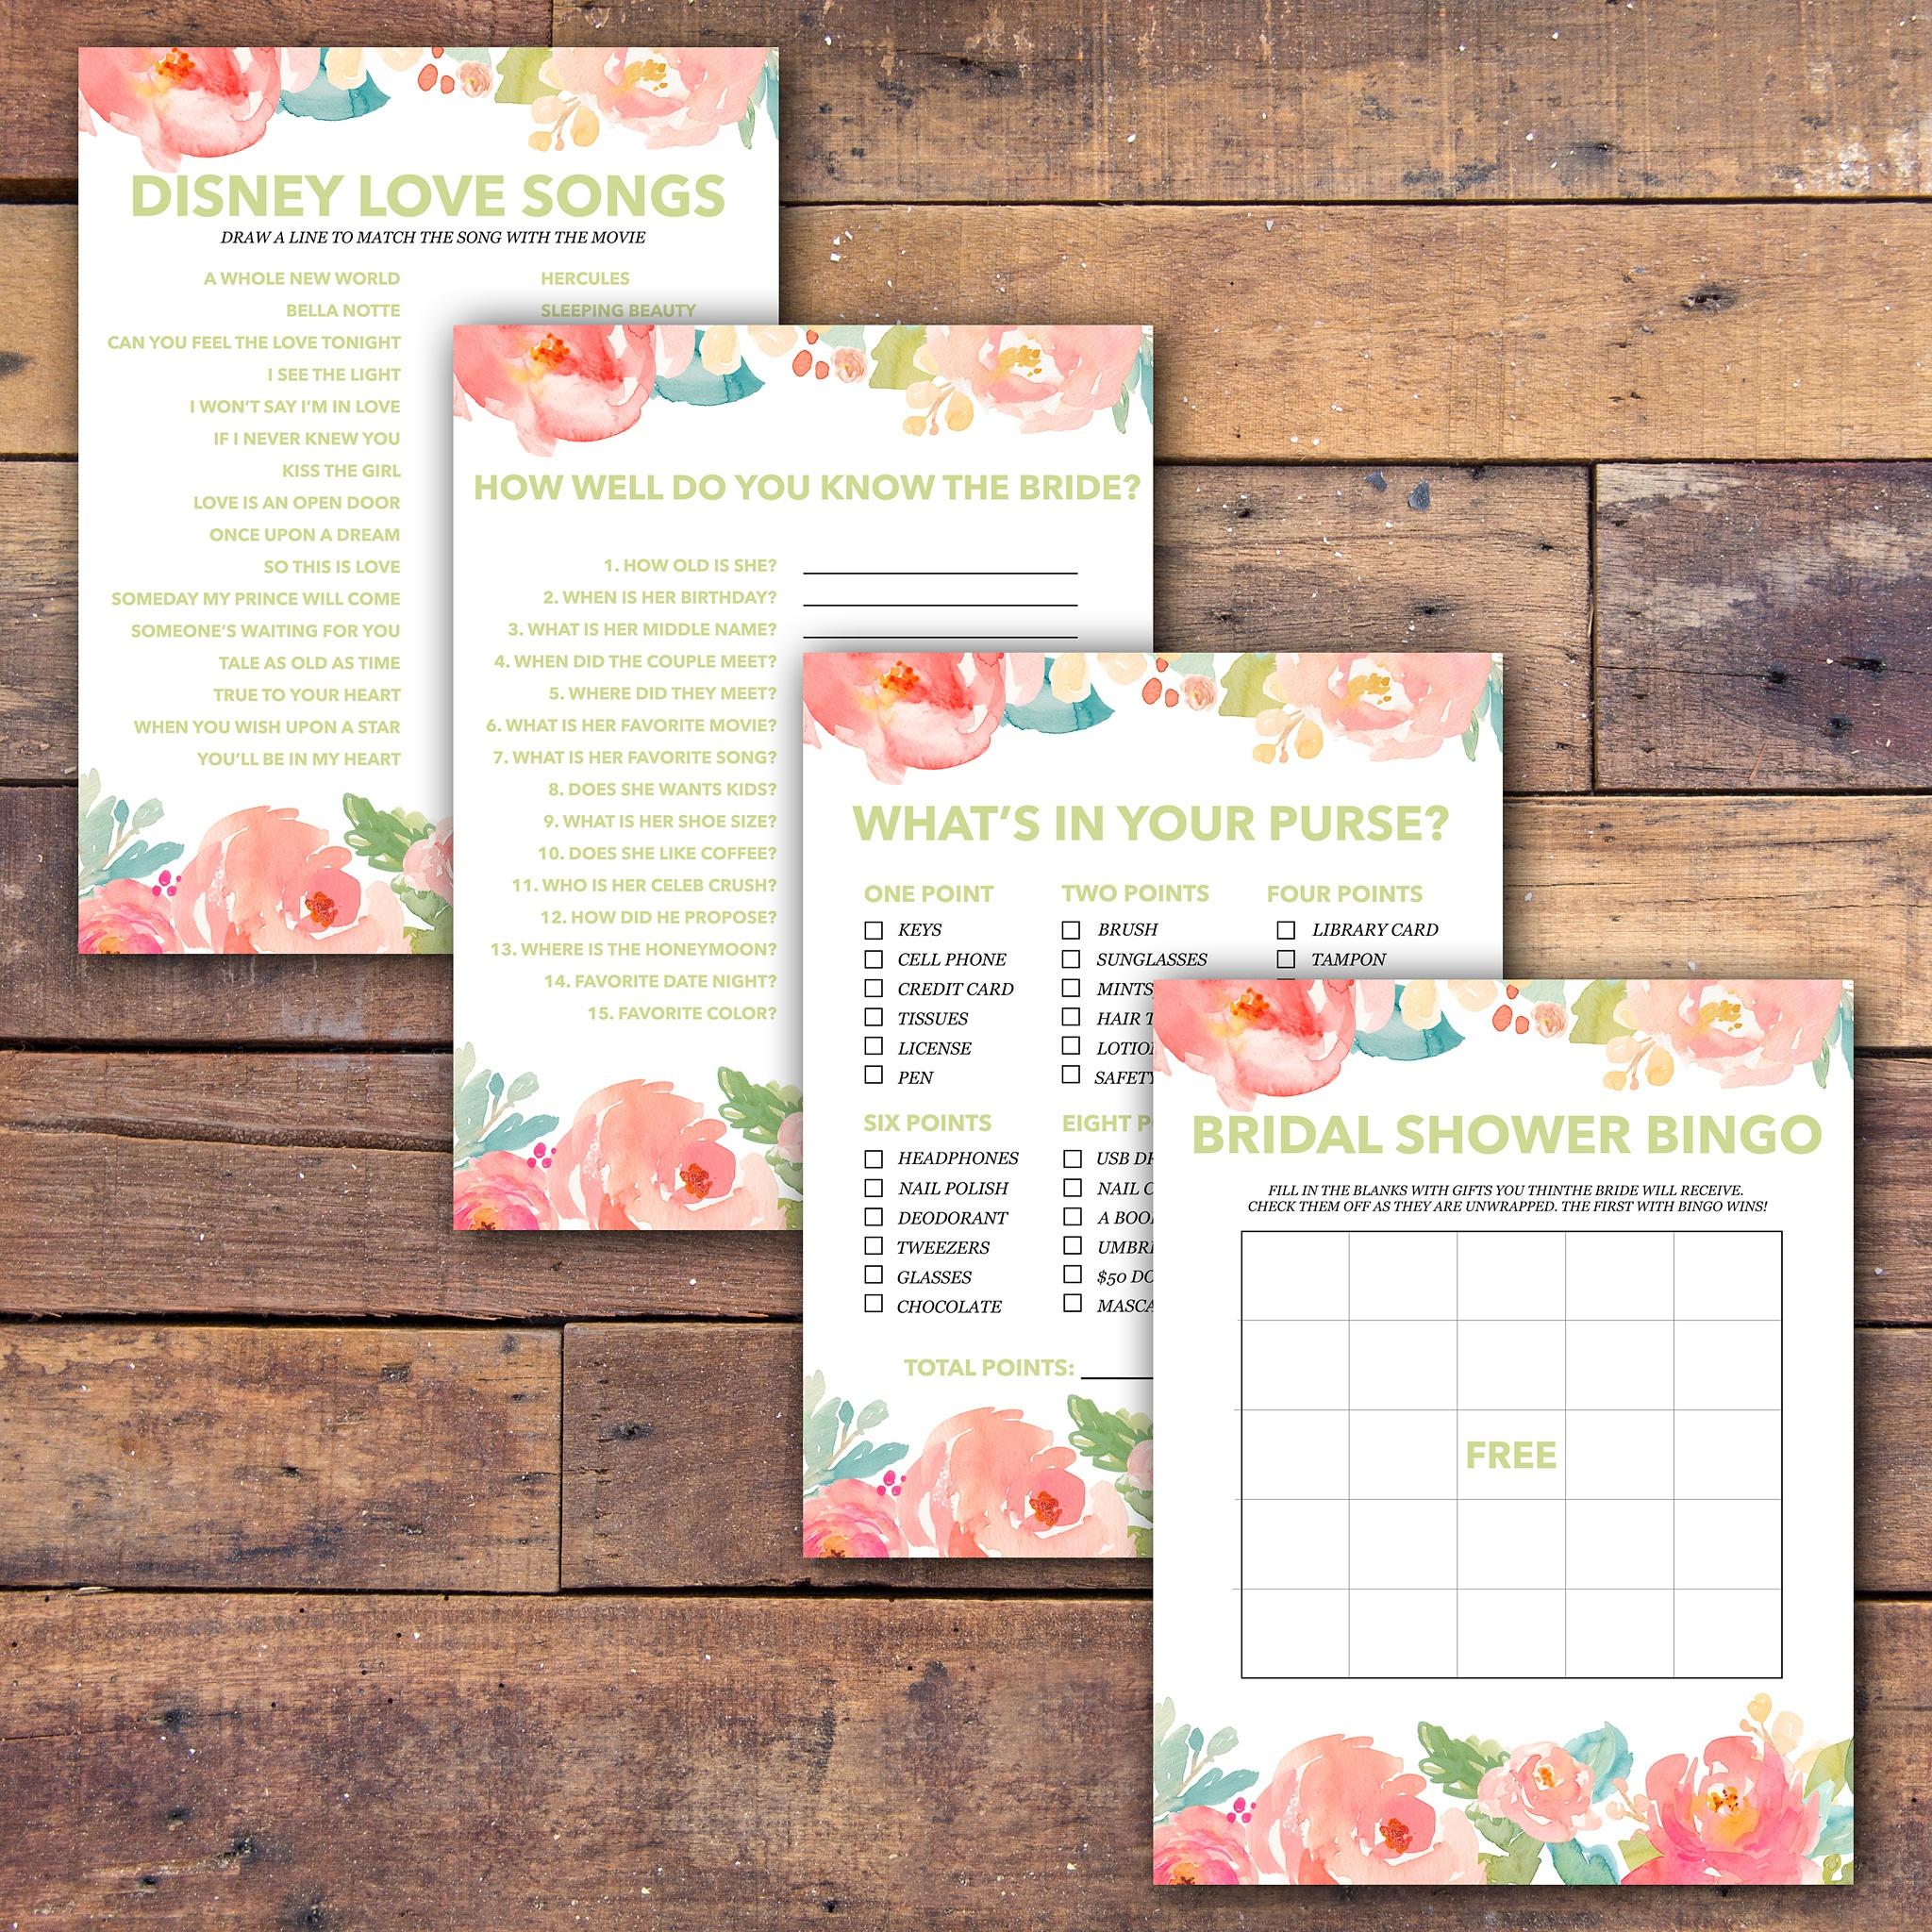 Bridal Shower Games Free Printable - - Samantha Jean Photograhy - Free Printable Bridal Shower Blank Bingo Games